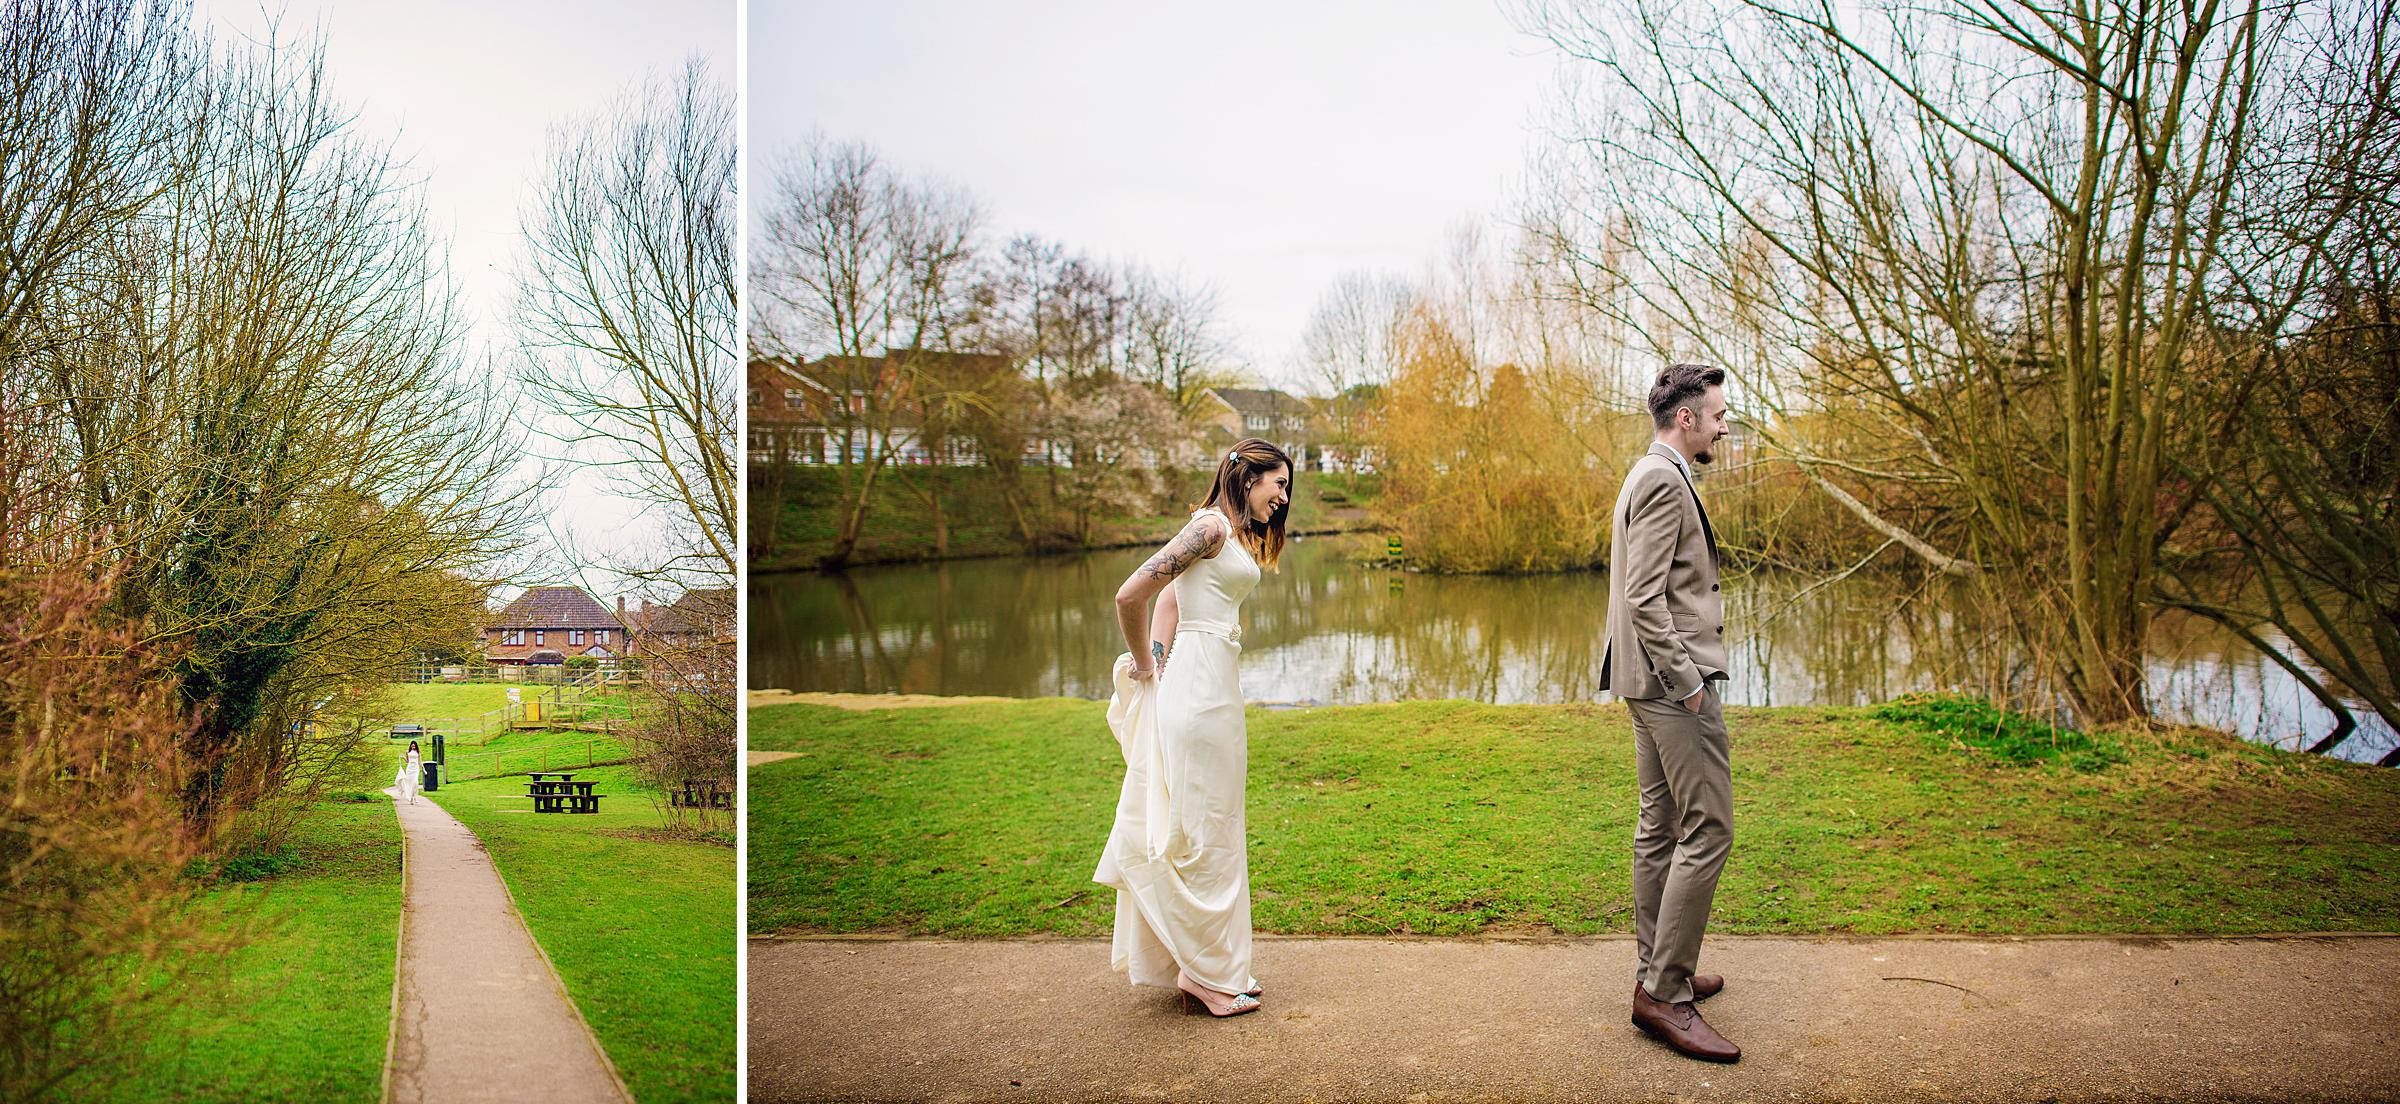 First Look Wedding Photography - Tunbridge Wells Photographer - Photography by Vicki